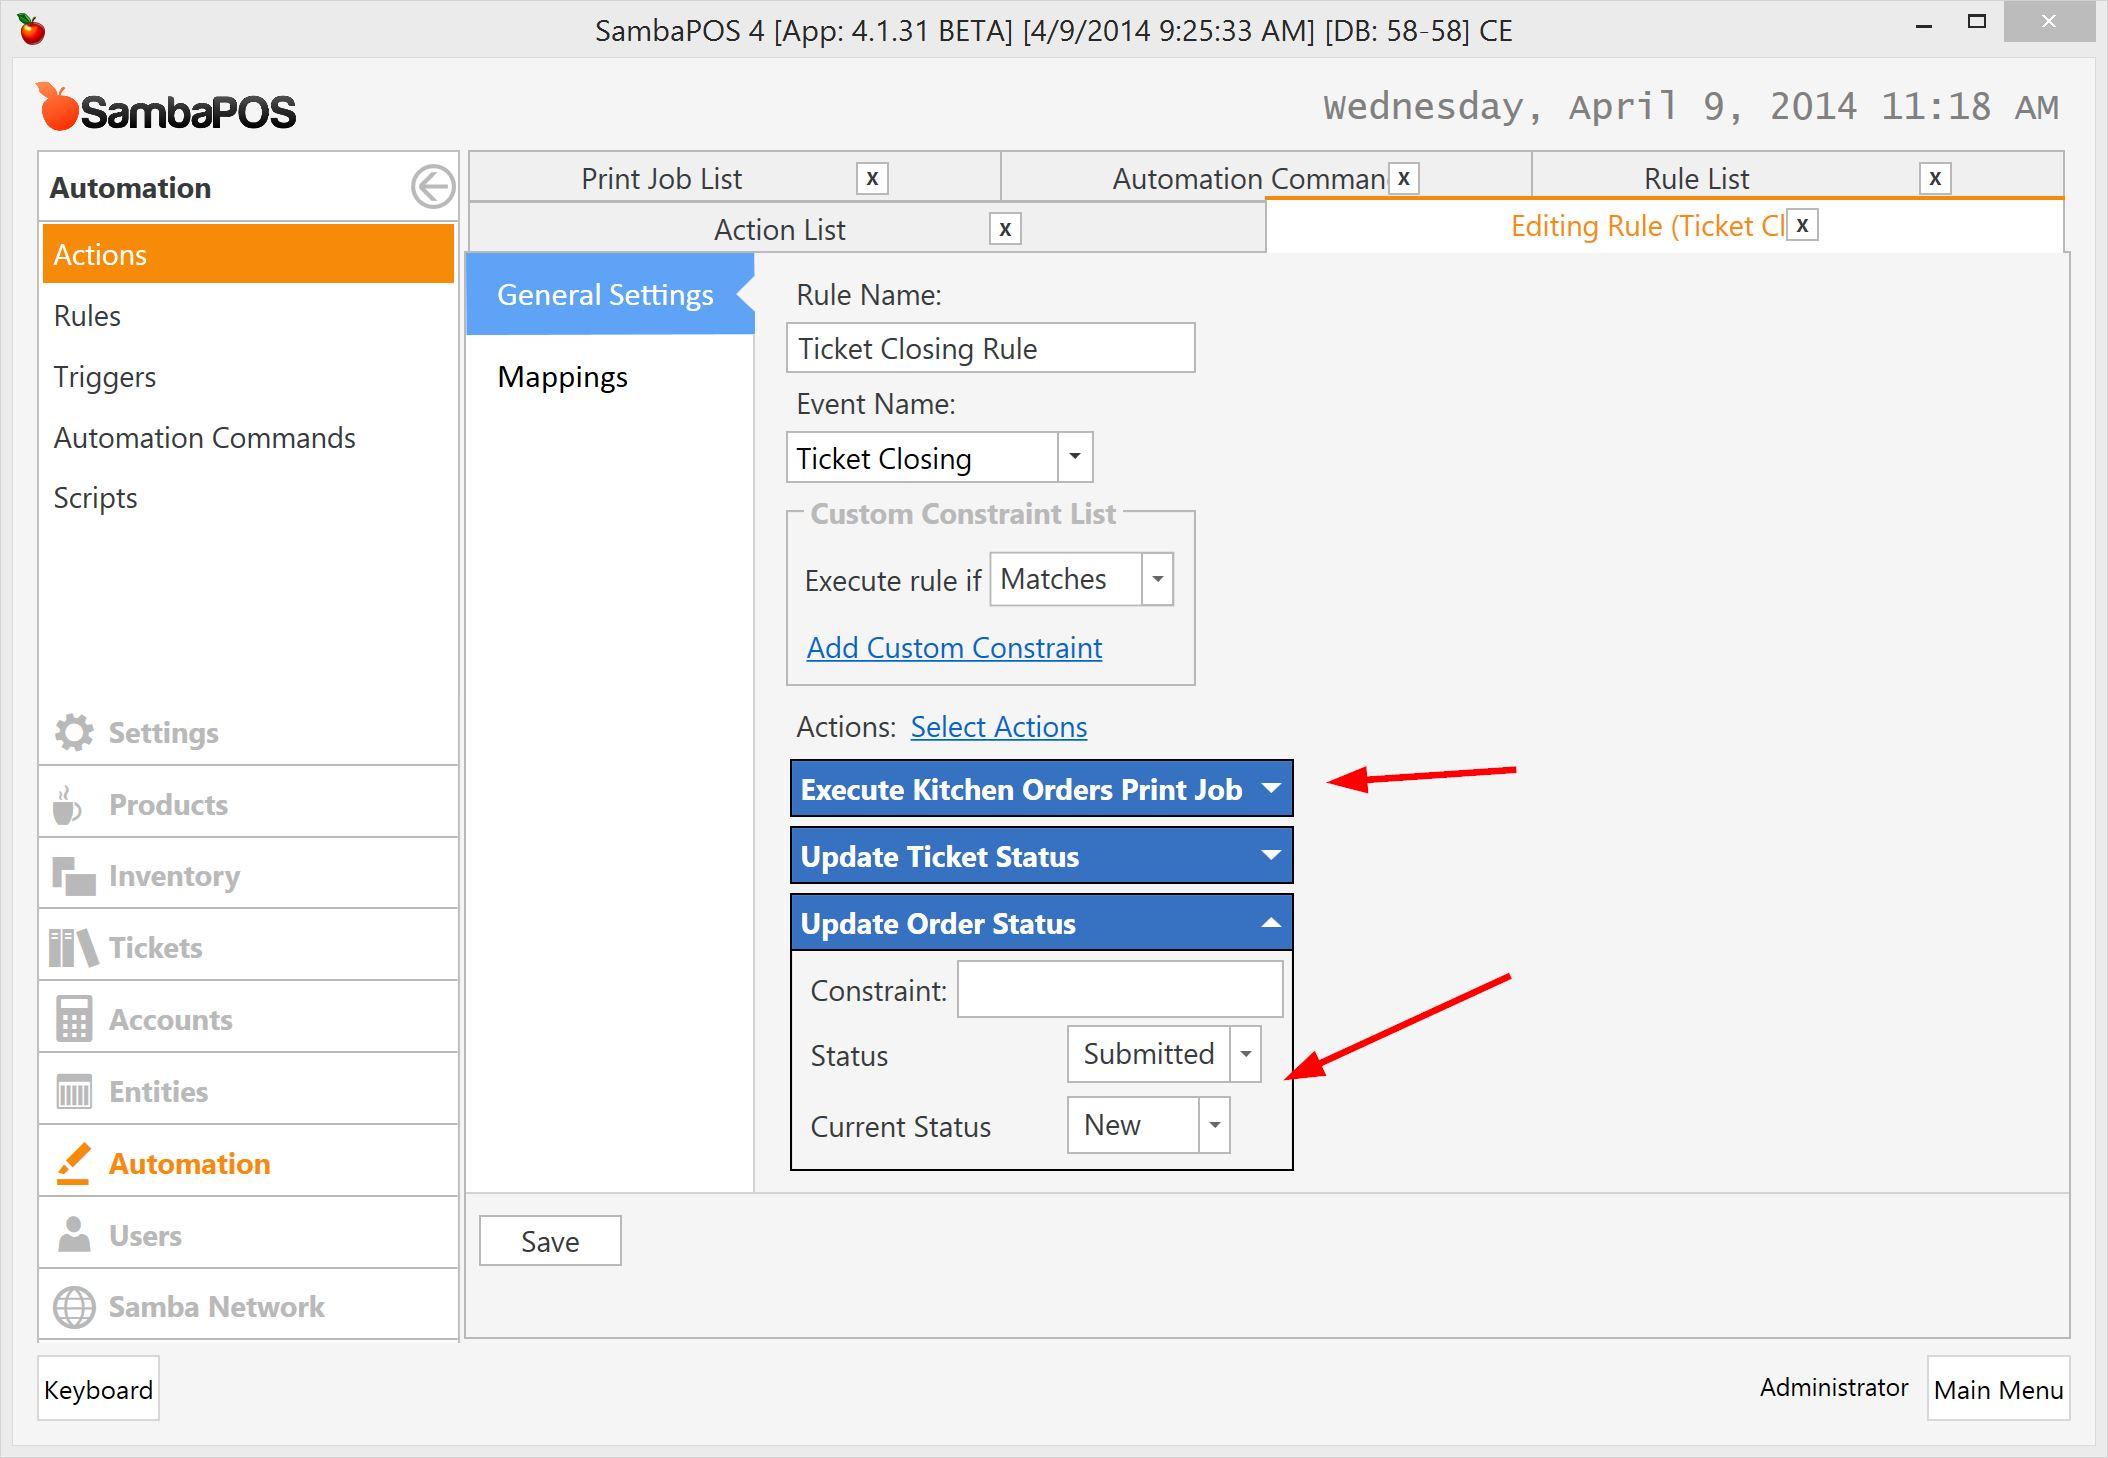 Printing Tutorial in Detail - V4 Tutorial - SambaClub Forum